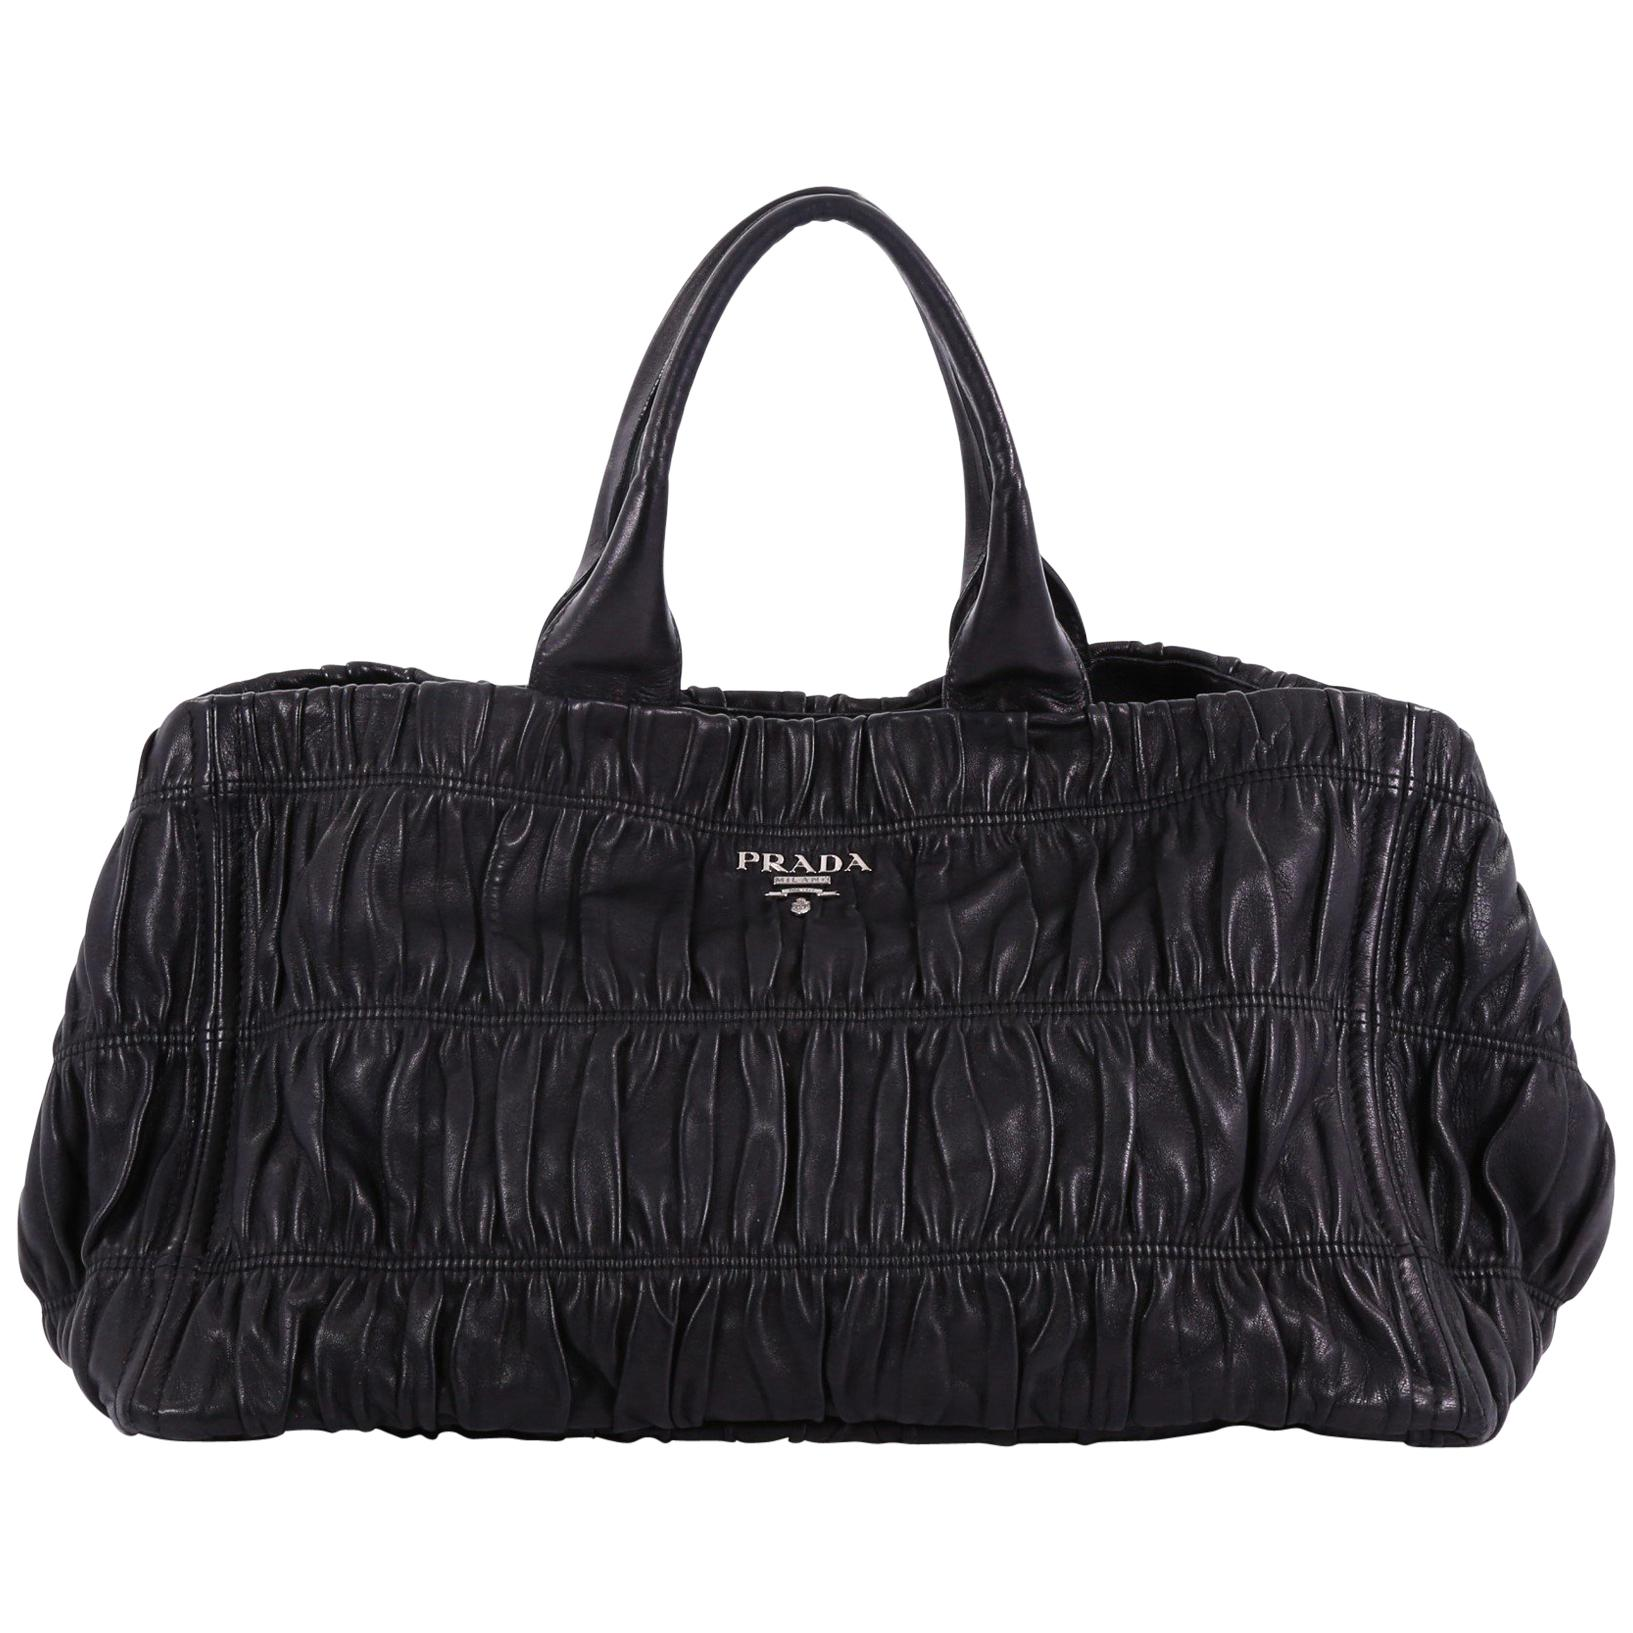 1147b9bc65ae Prada Gaufre Shopping Tote Nappa Leather Large at 1stdibs